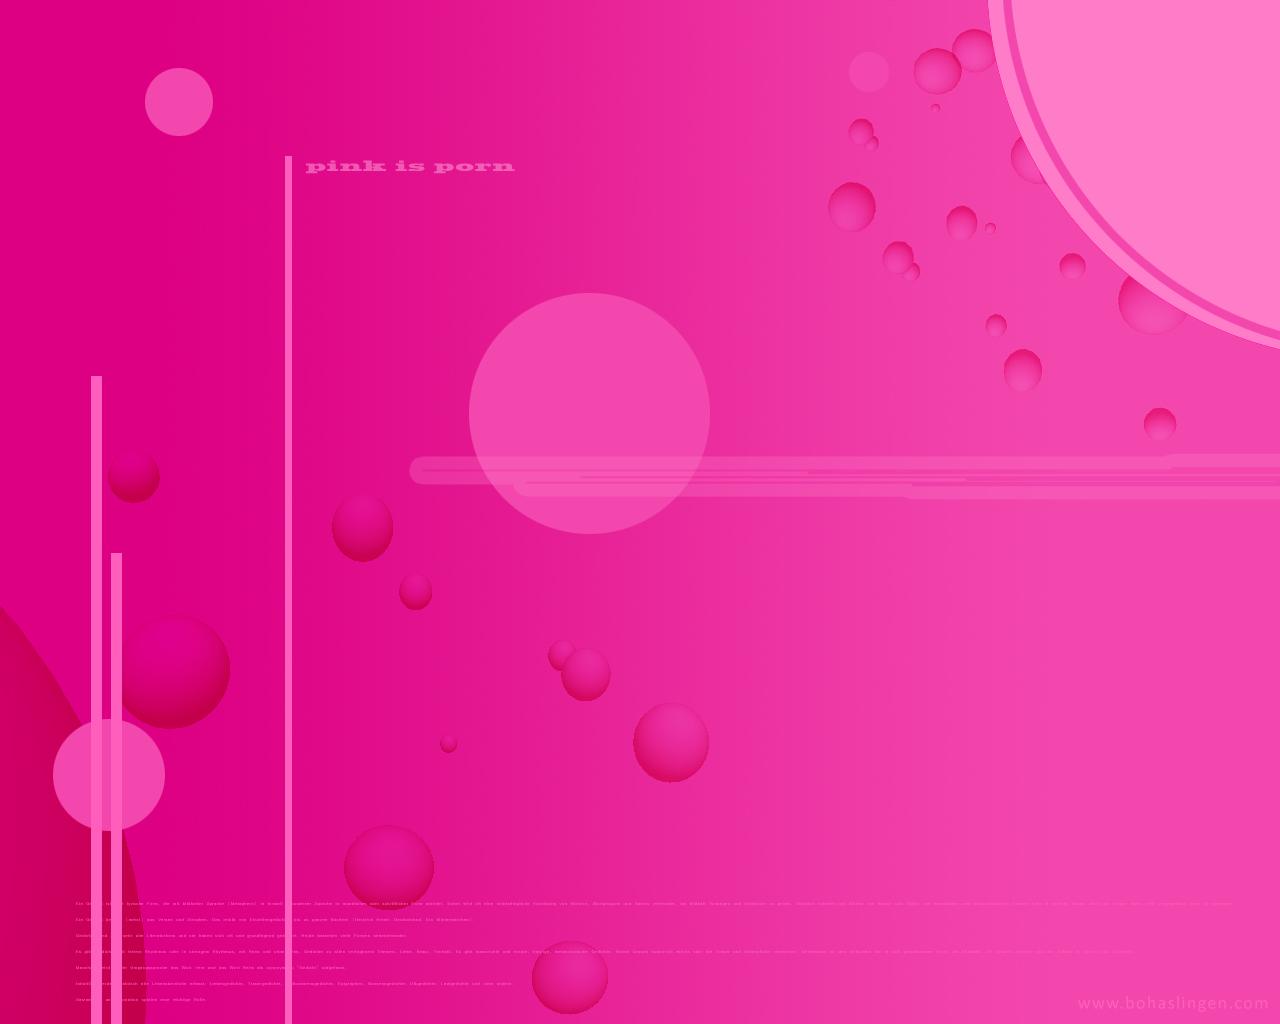 Walpaper Warna Pink Biru   Rumah Minimalis Modern 1280x1024